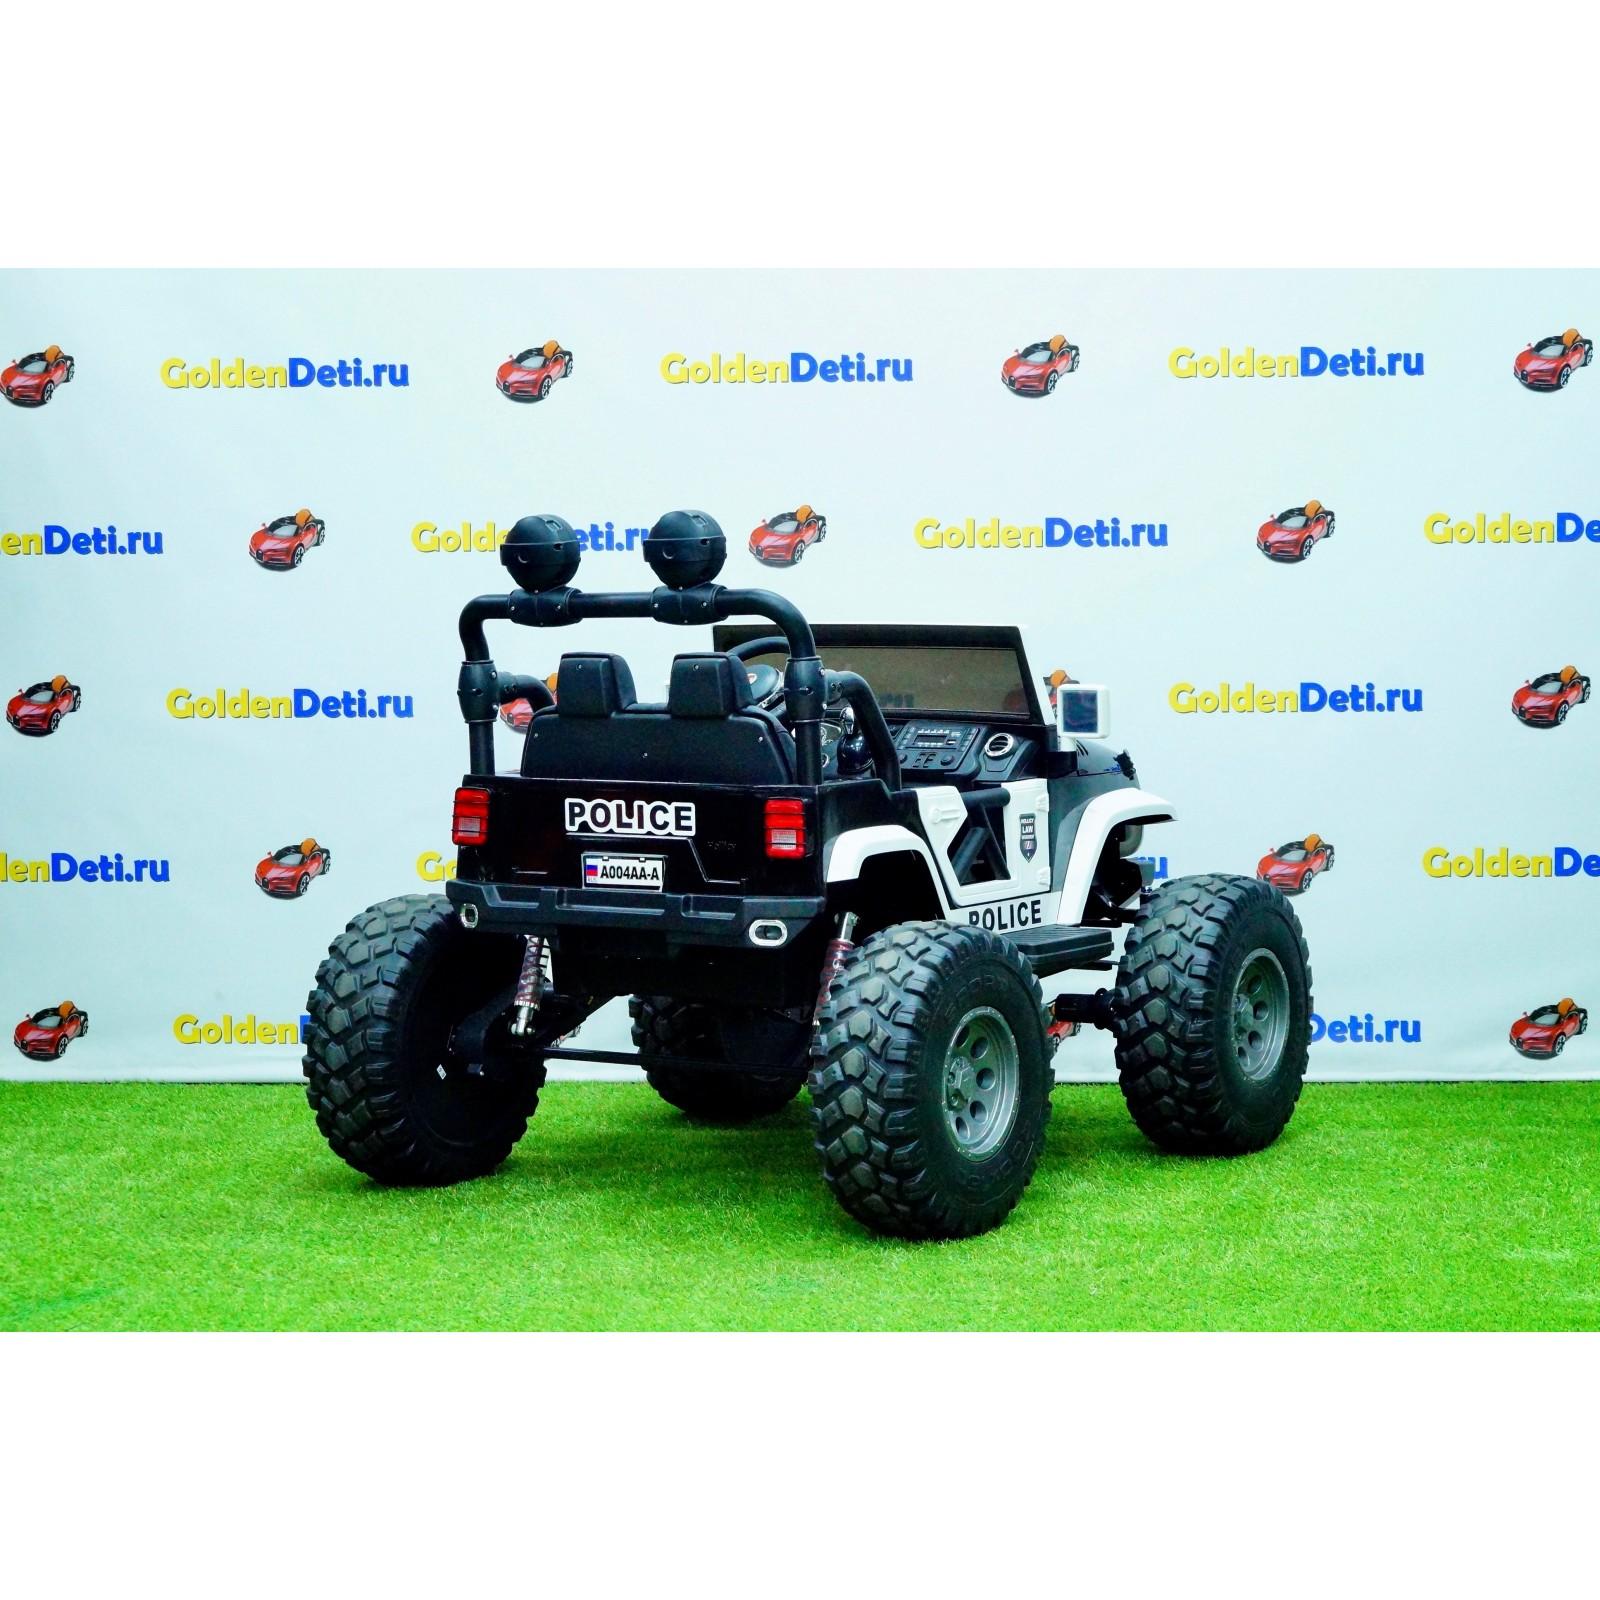 Детский электромобиль Jeep A004AA-A Police